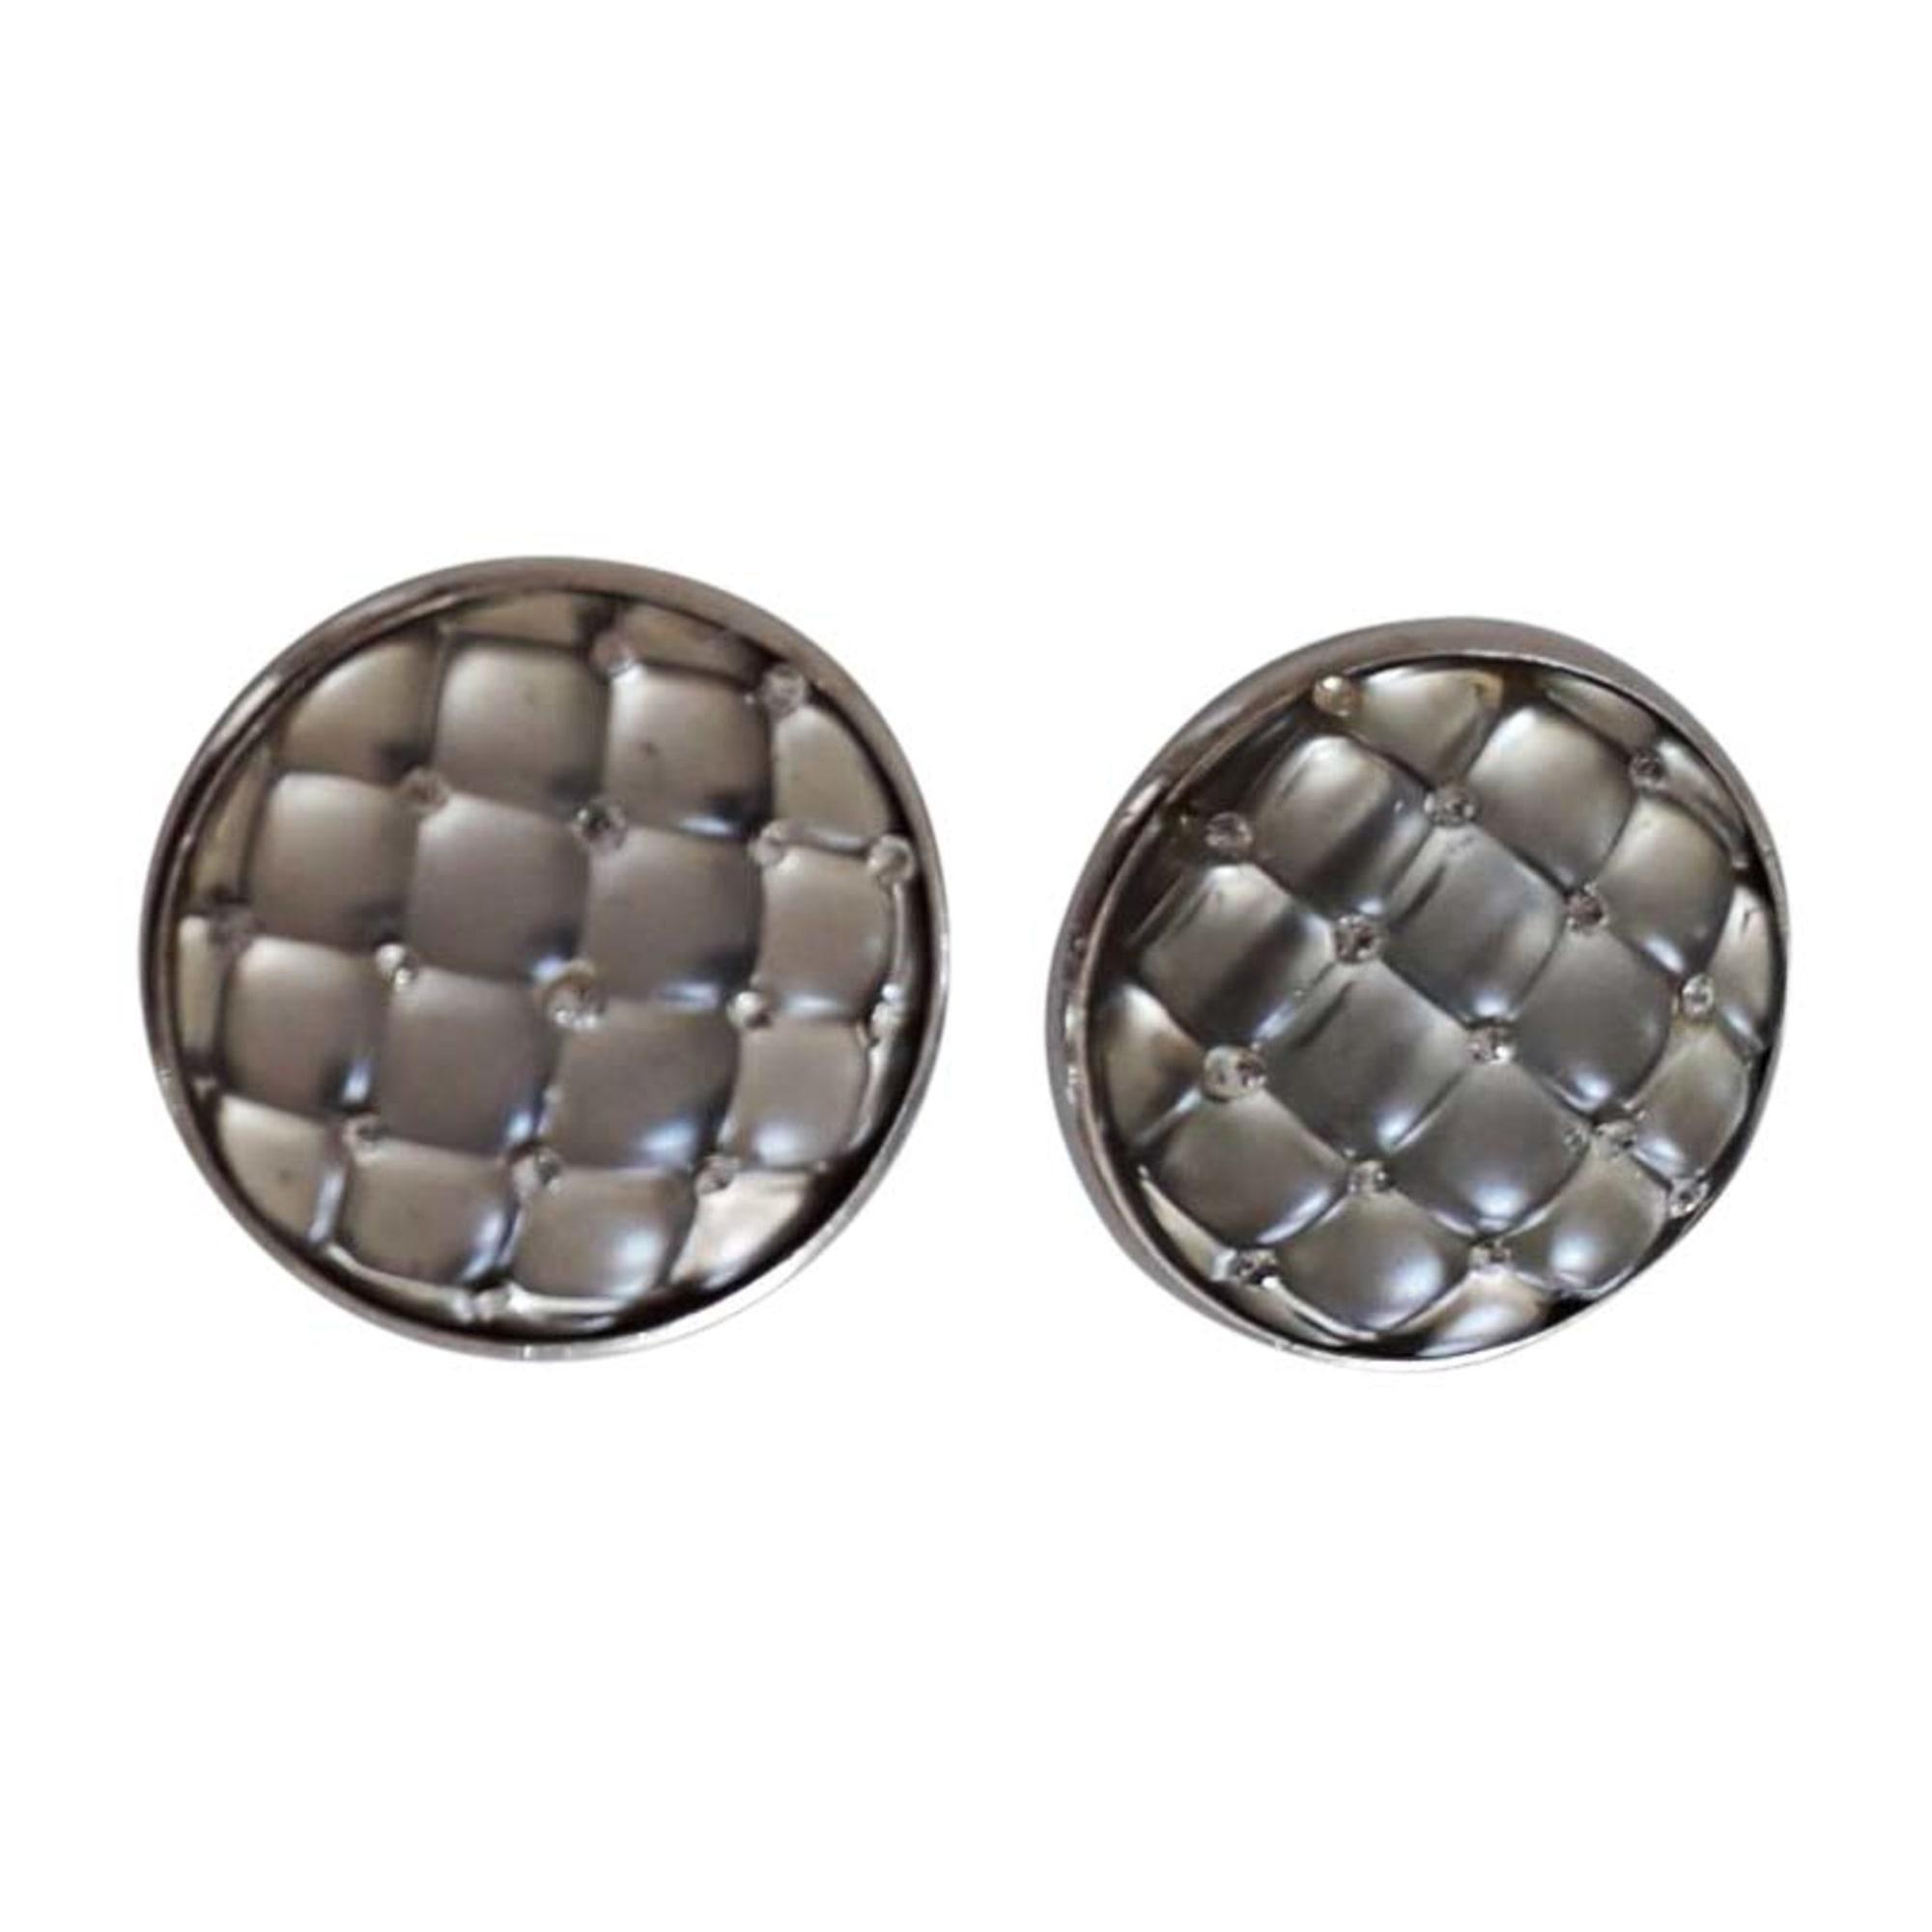 Earrings SONIA RYKIEL argenté et tanslucide